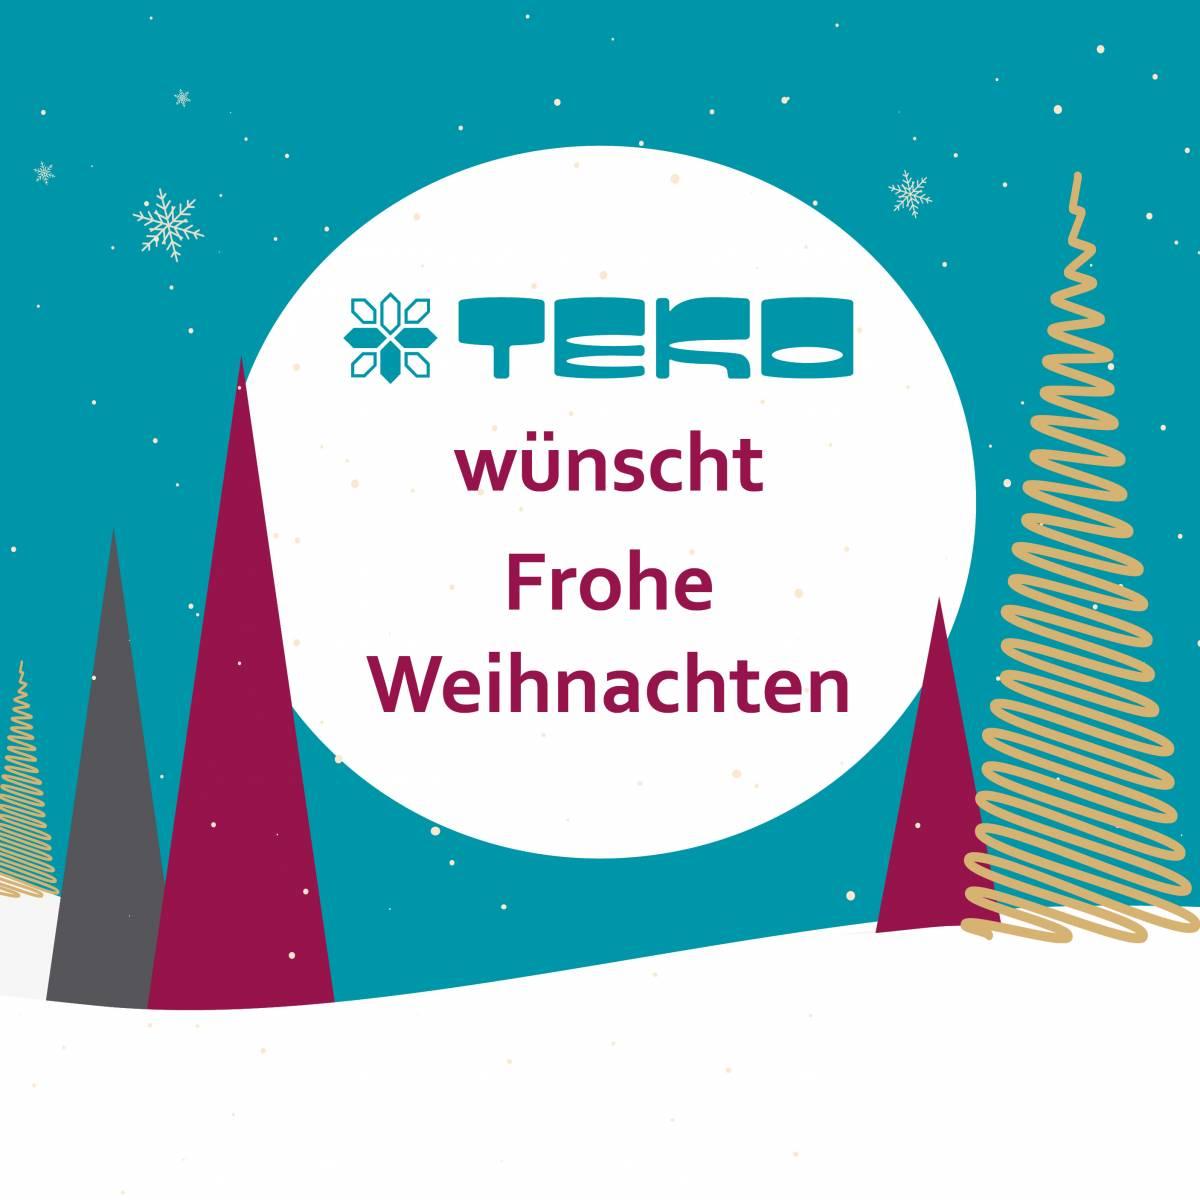 teko news weihnachten 2019 675x675px - Betriebsruhe 2019-2020